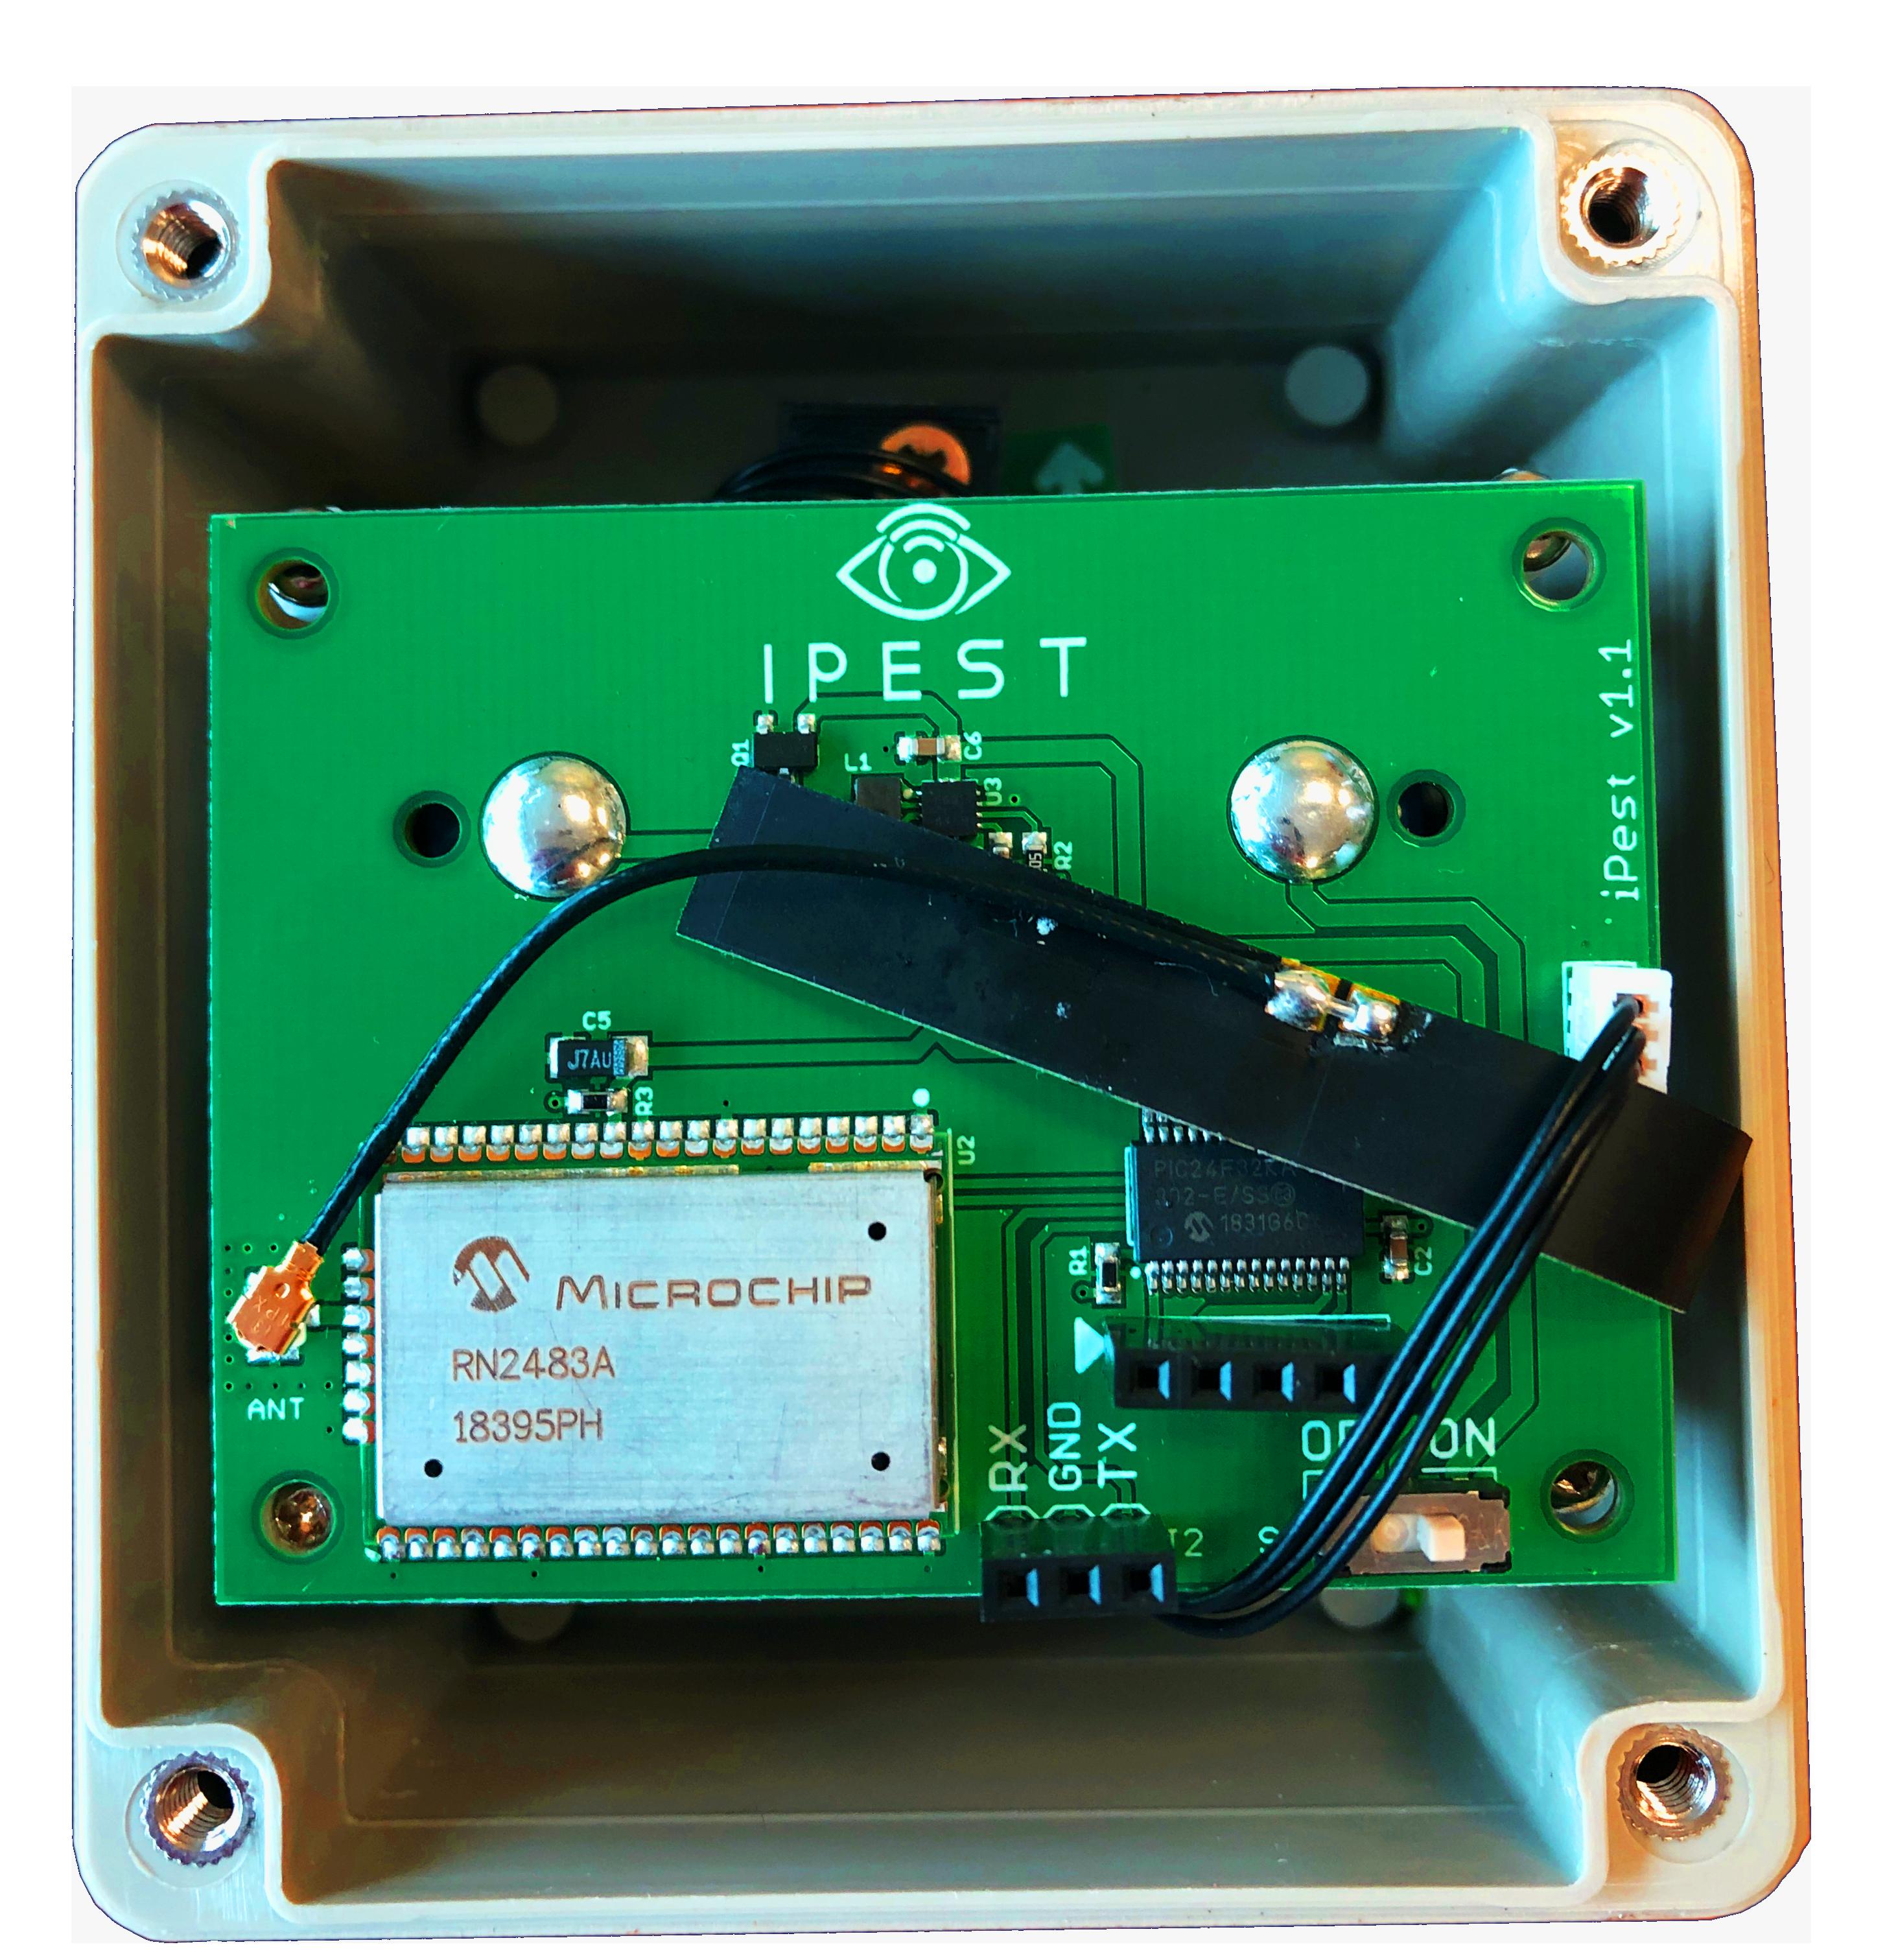 Ipest Pro circuit board